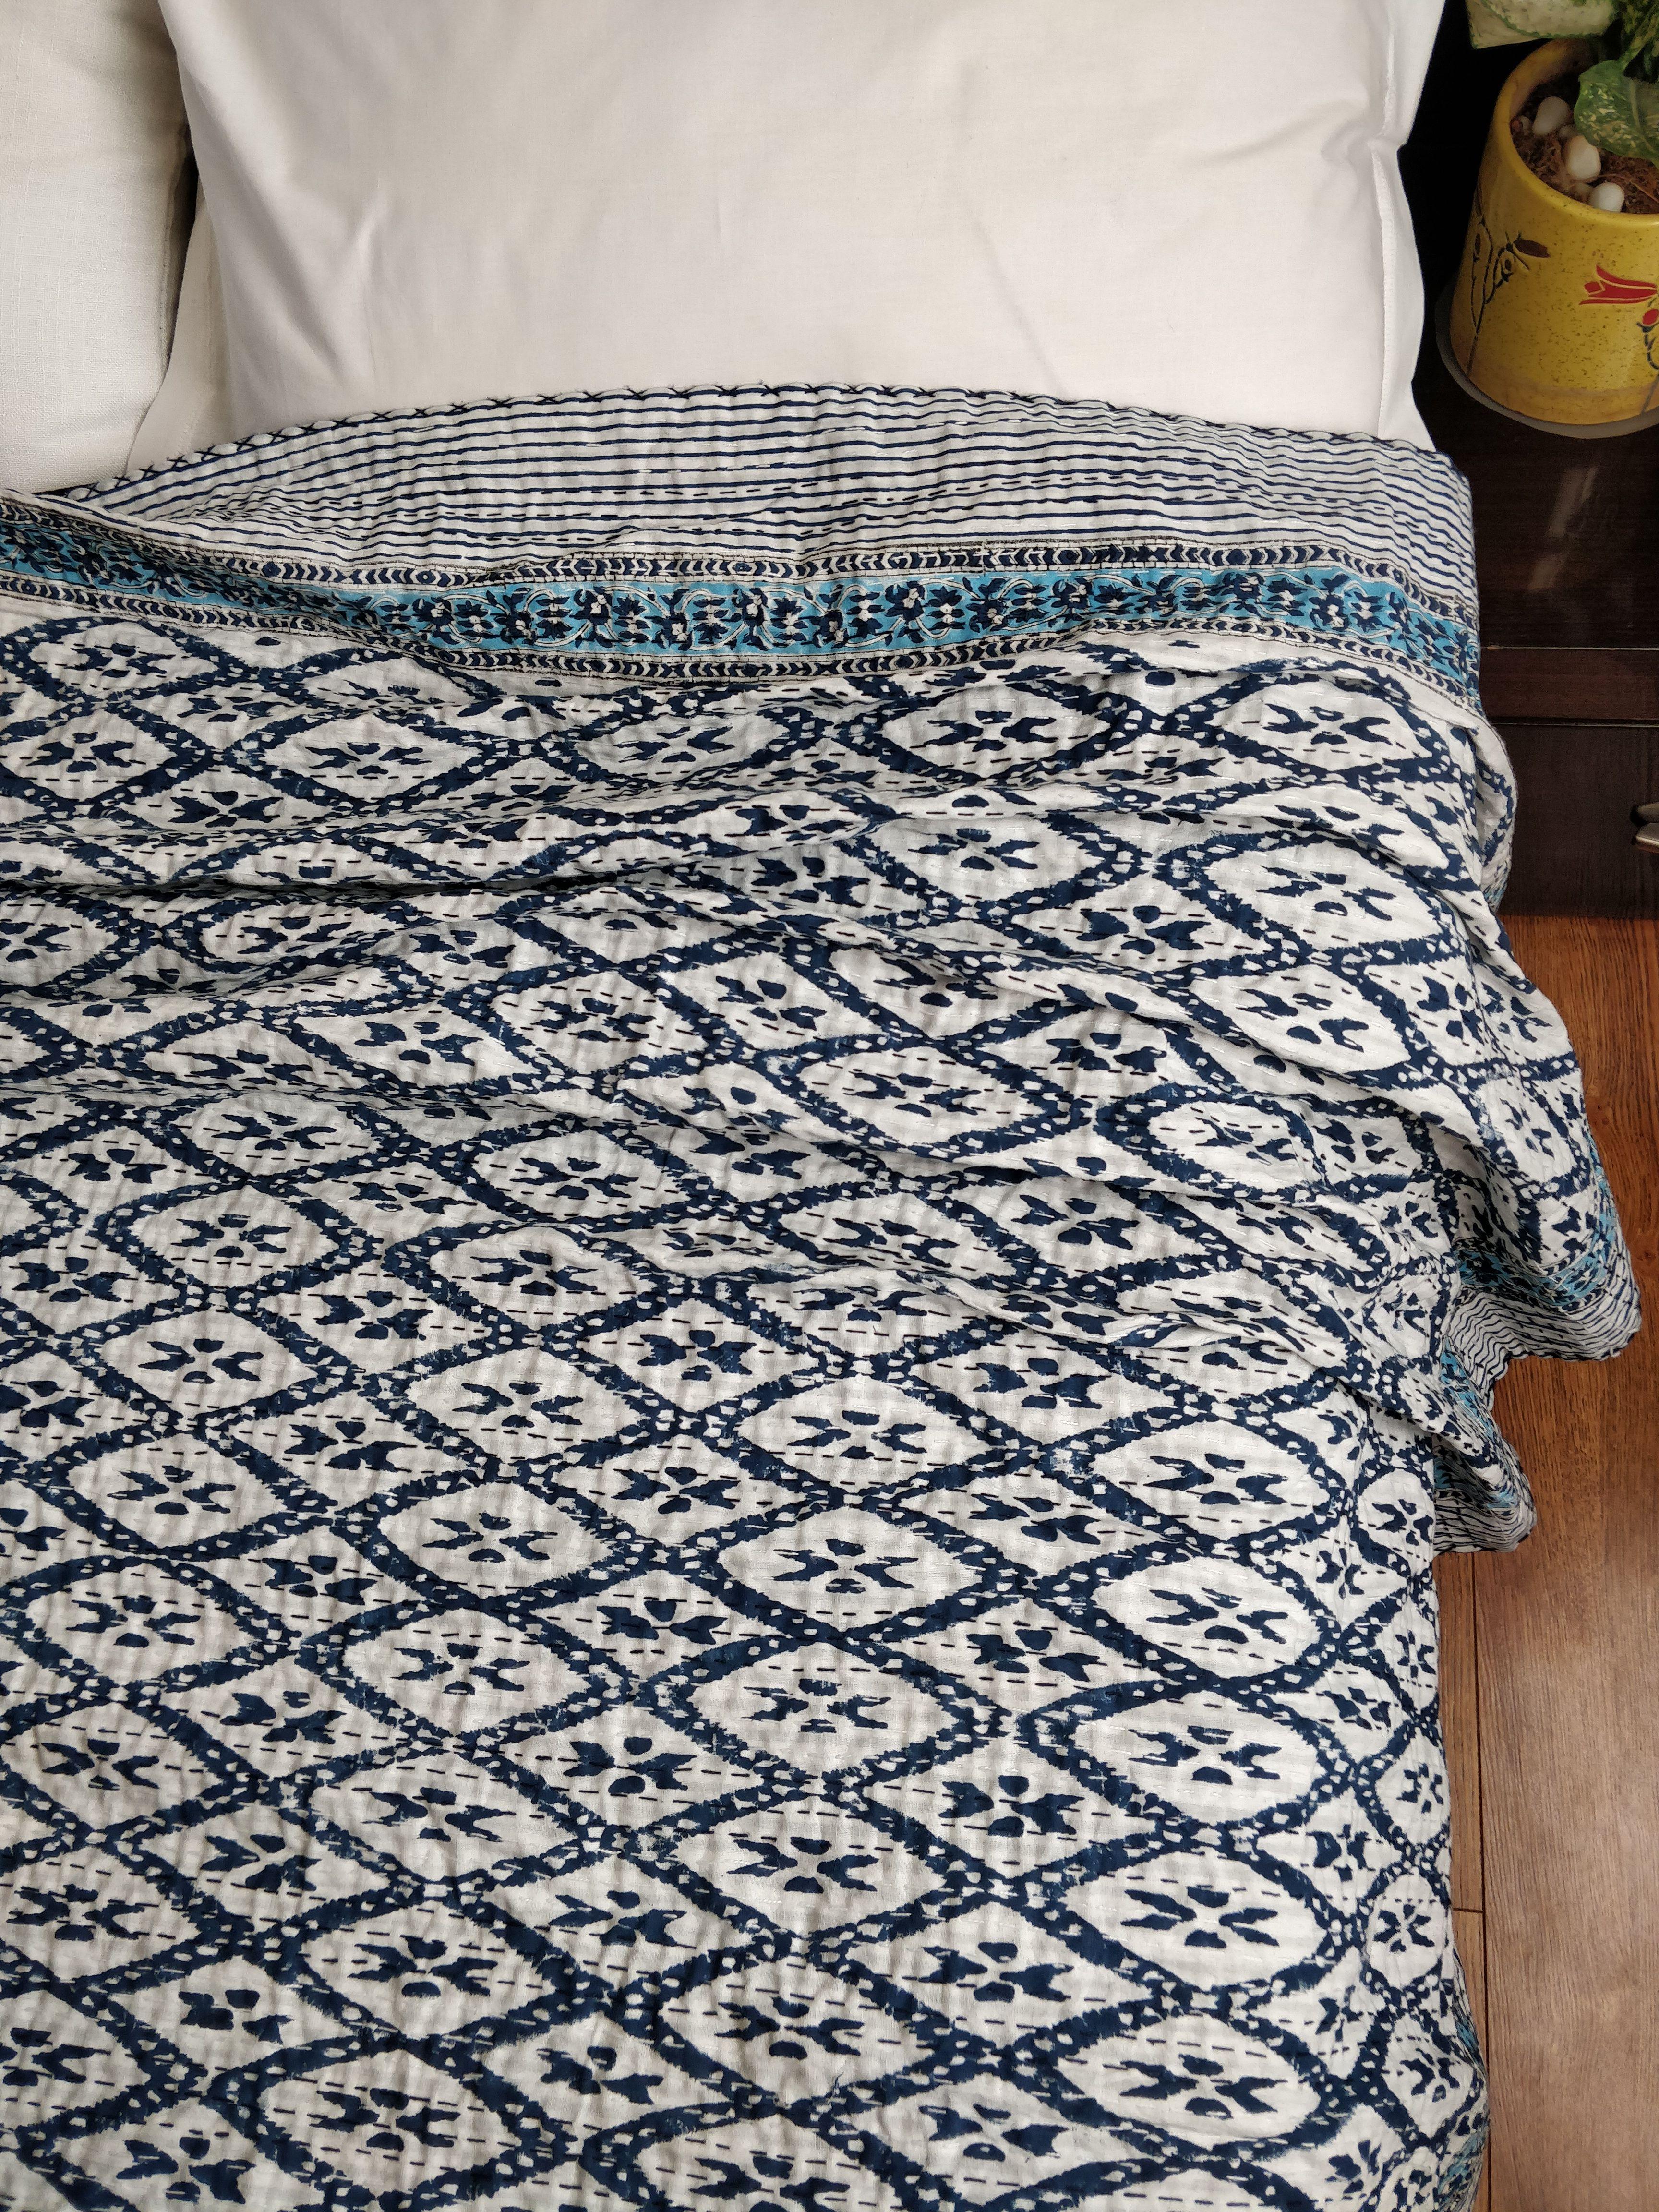 Indian Handmade Kantha Quilt Reversible Hand Block Printed Quilt Bedspread Throw Cotton Blanket